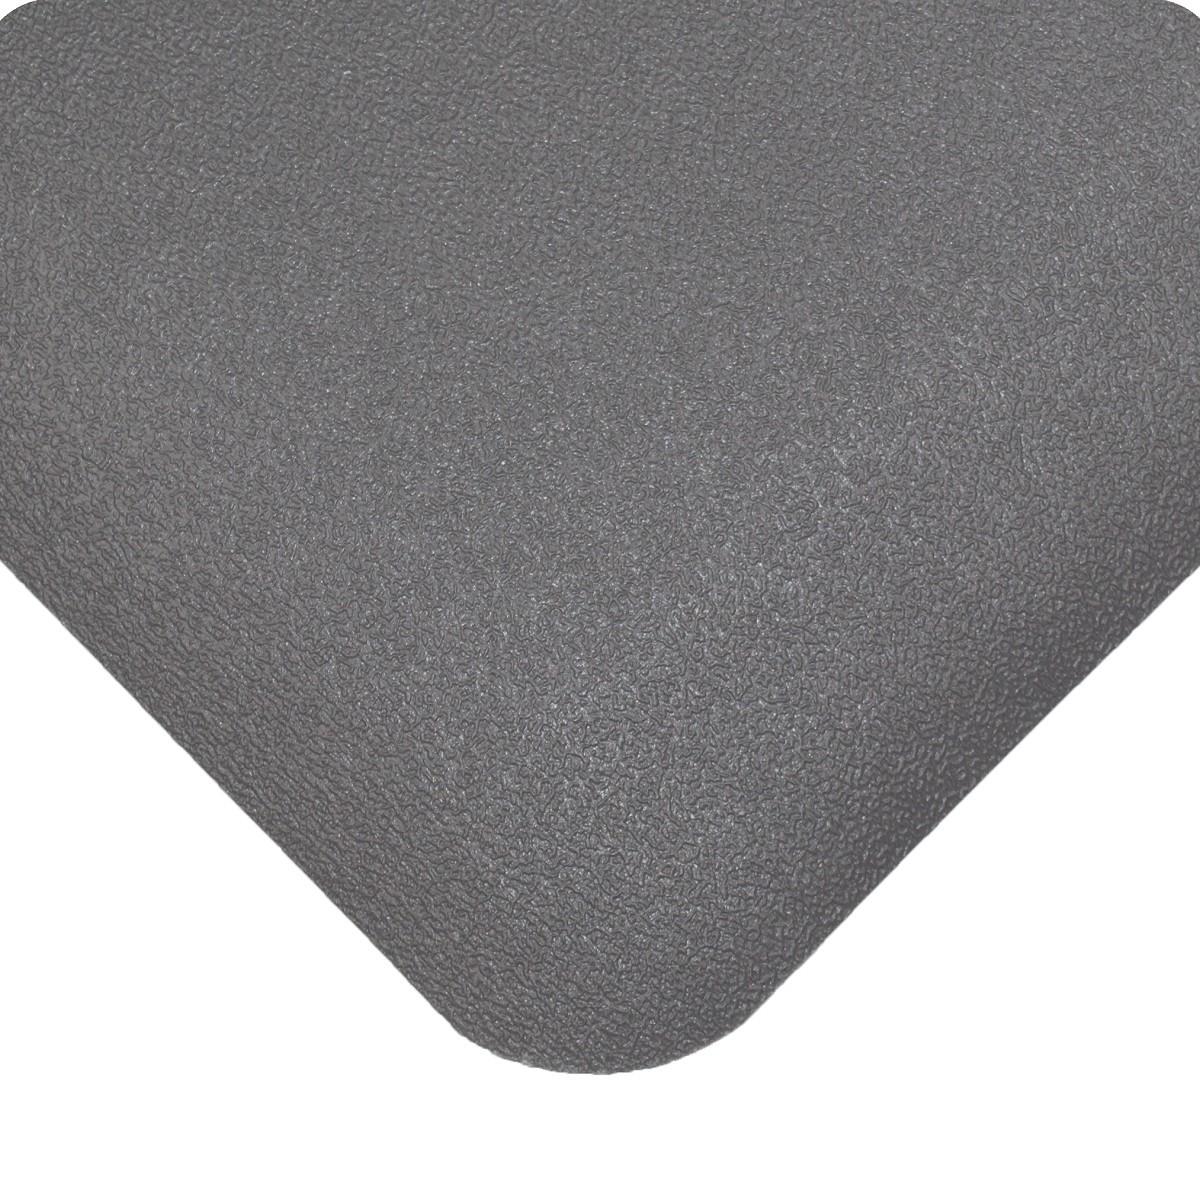 Wearwell 423 Soft Rock Floor Mat Slate Fullsource Com